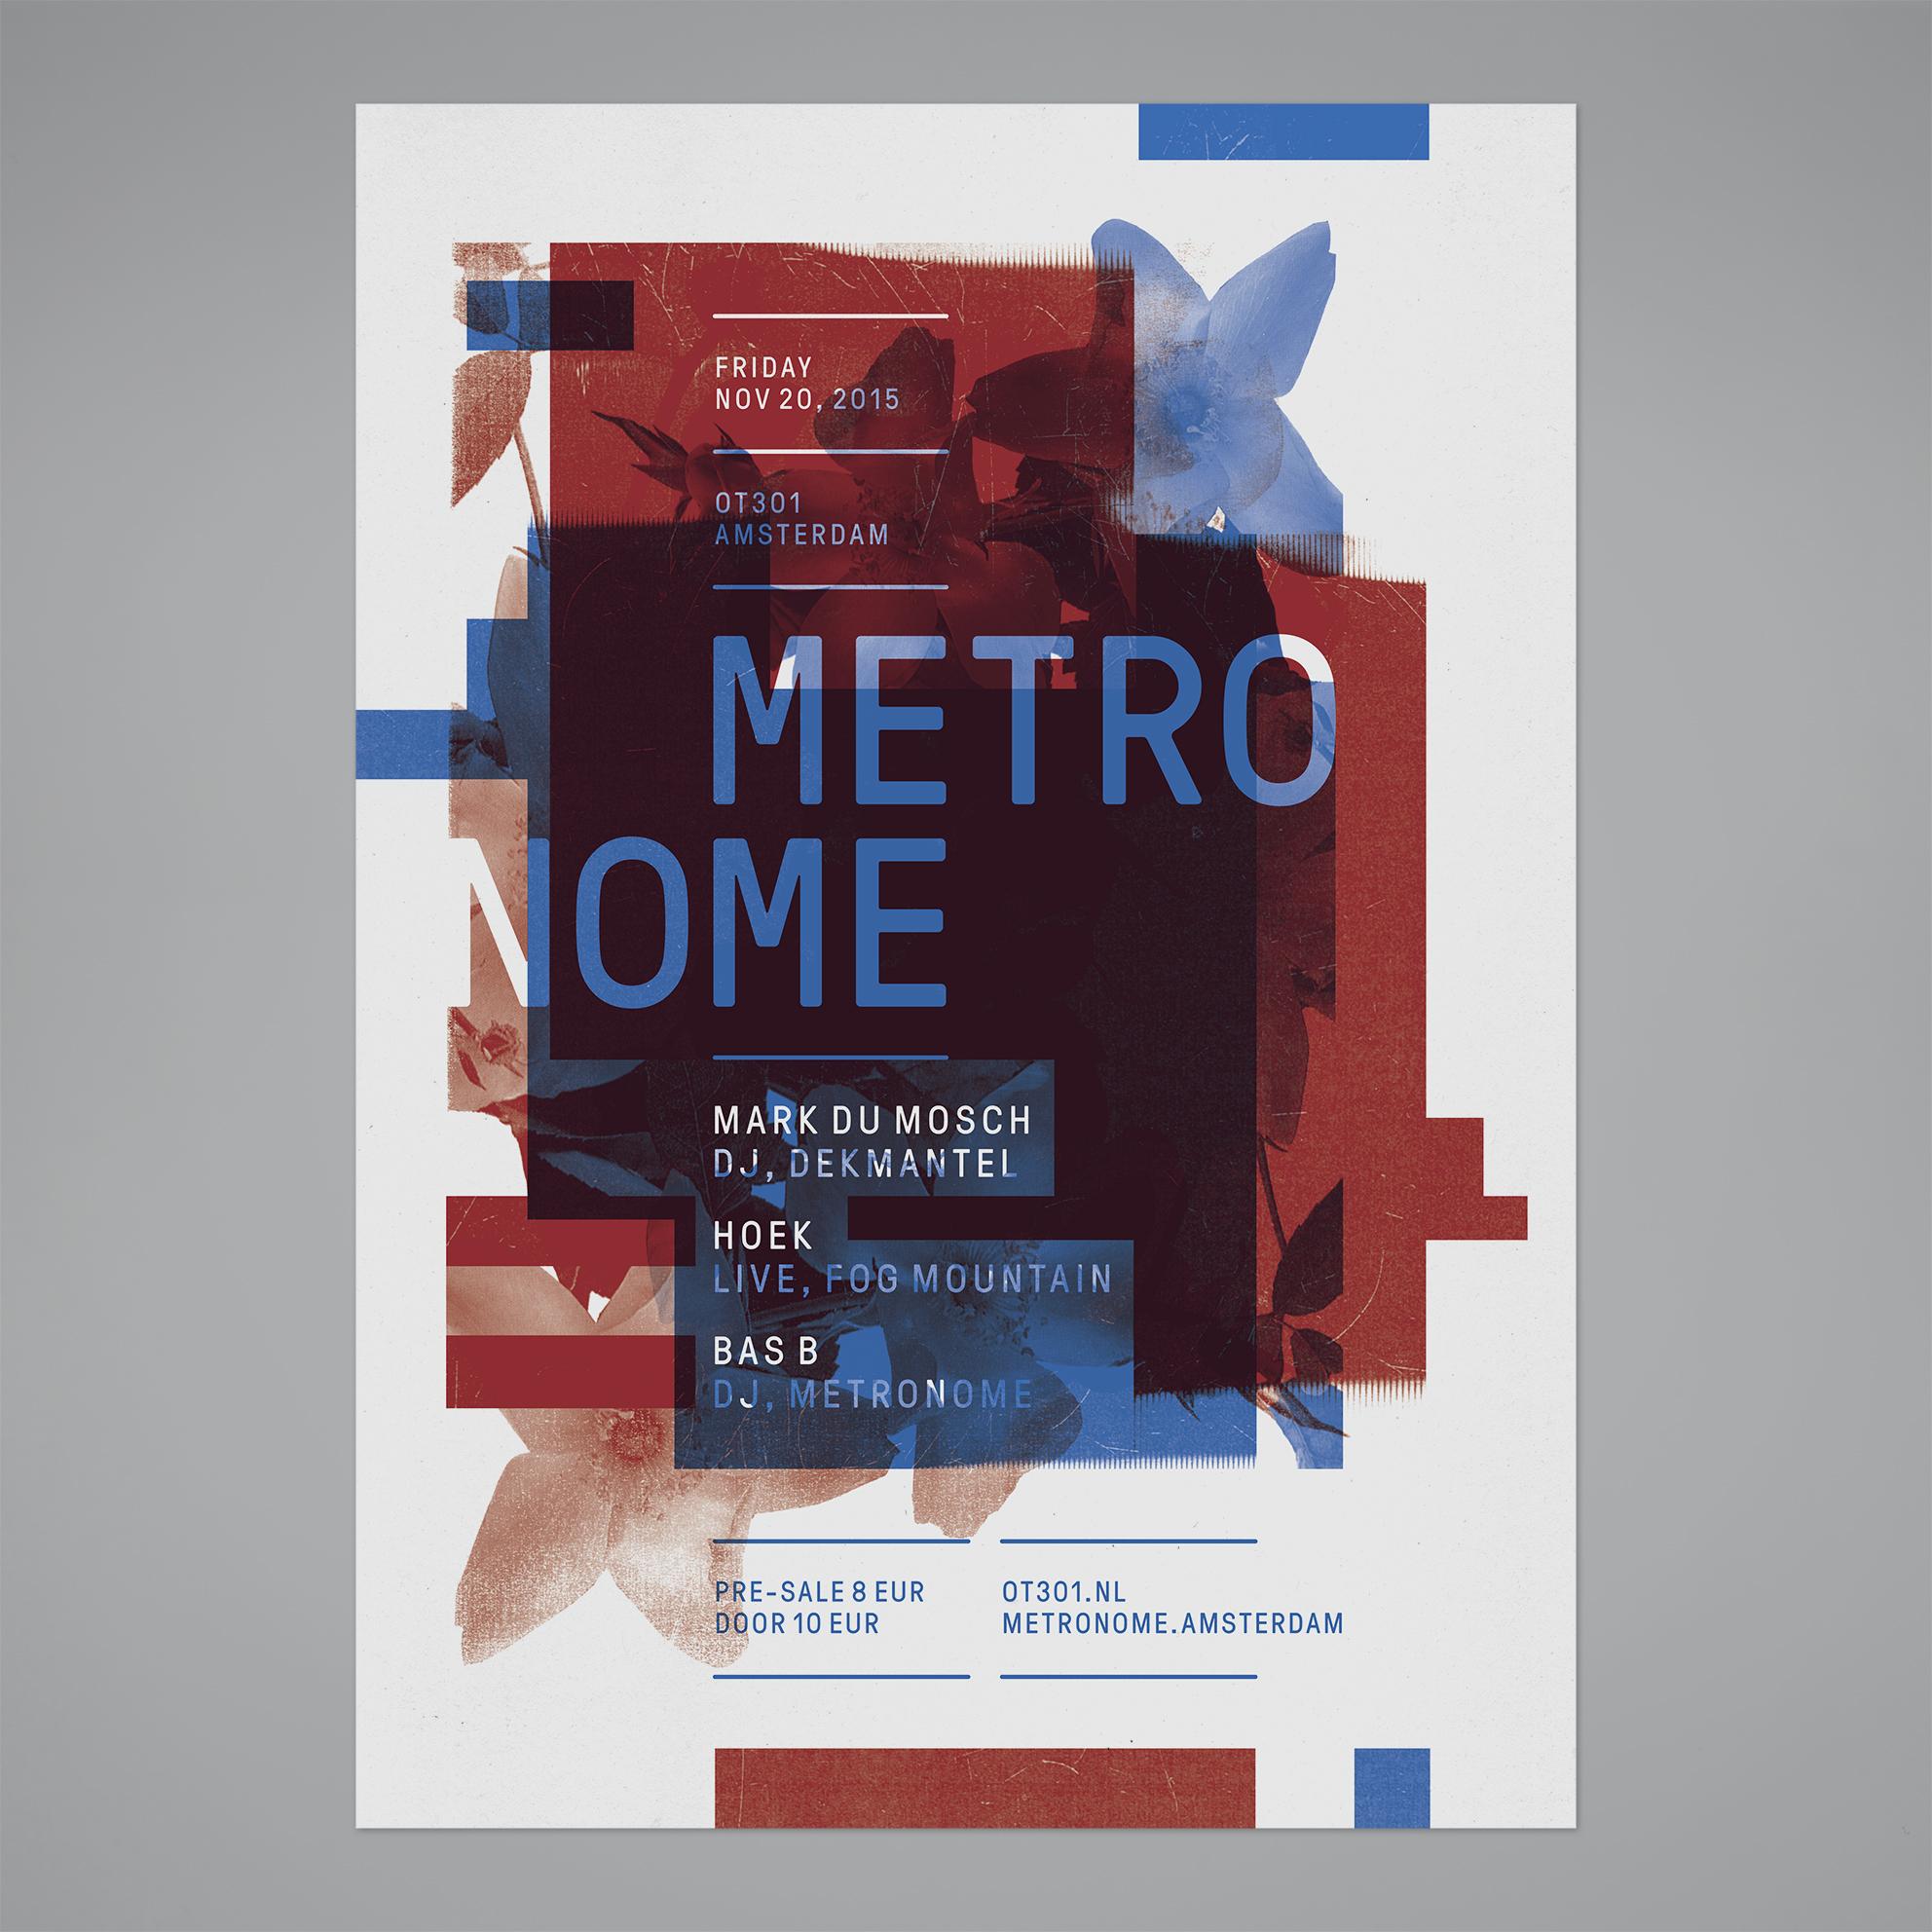 Metronome – Poster, 2015